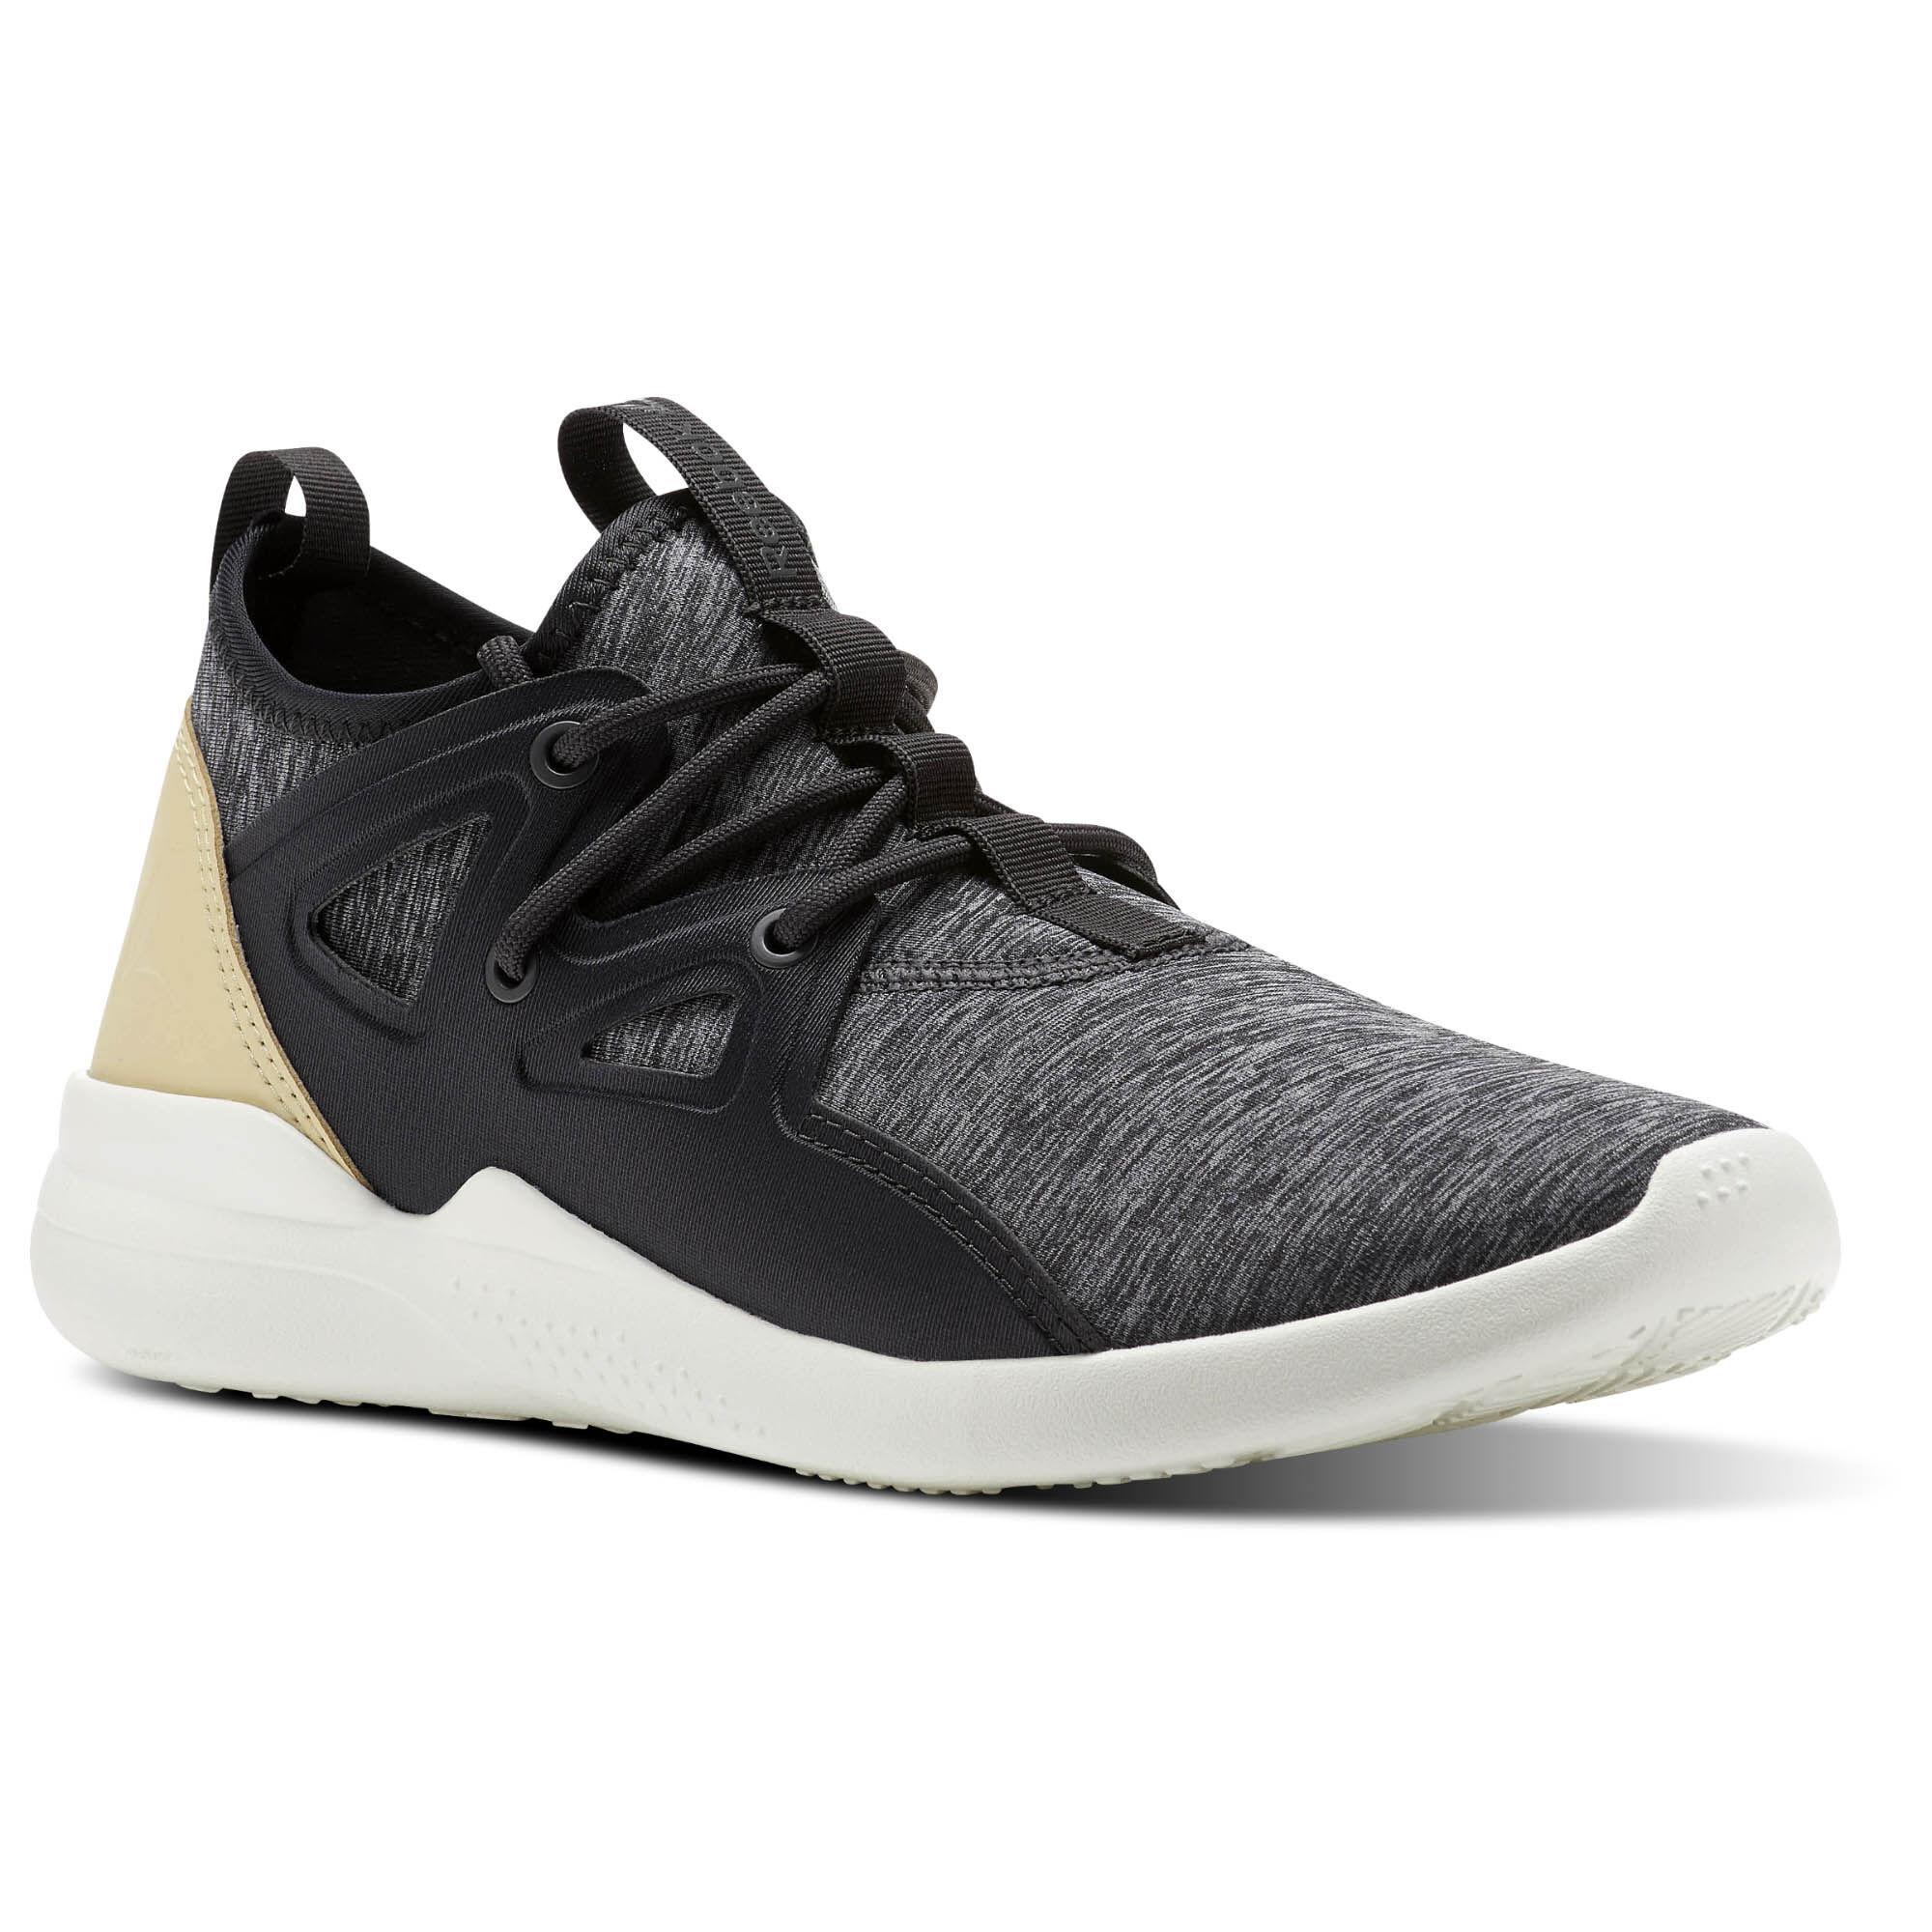 Schuhe Reebok - Cardio Motion CN4865 Blue/Grey/White/Pink ZXcJAq